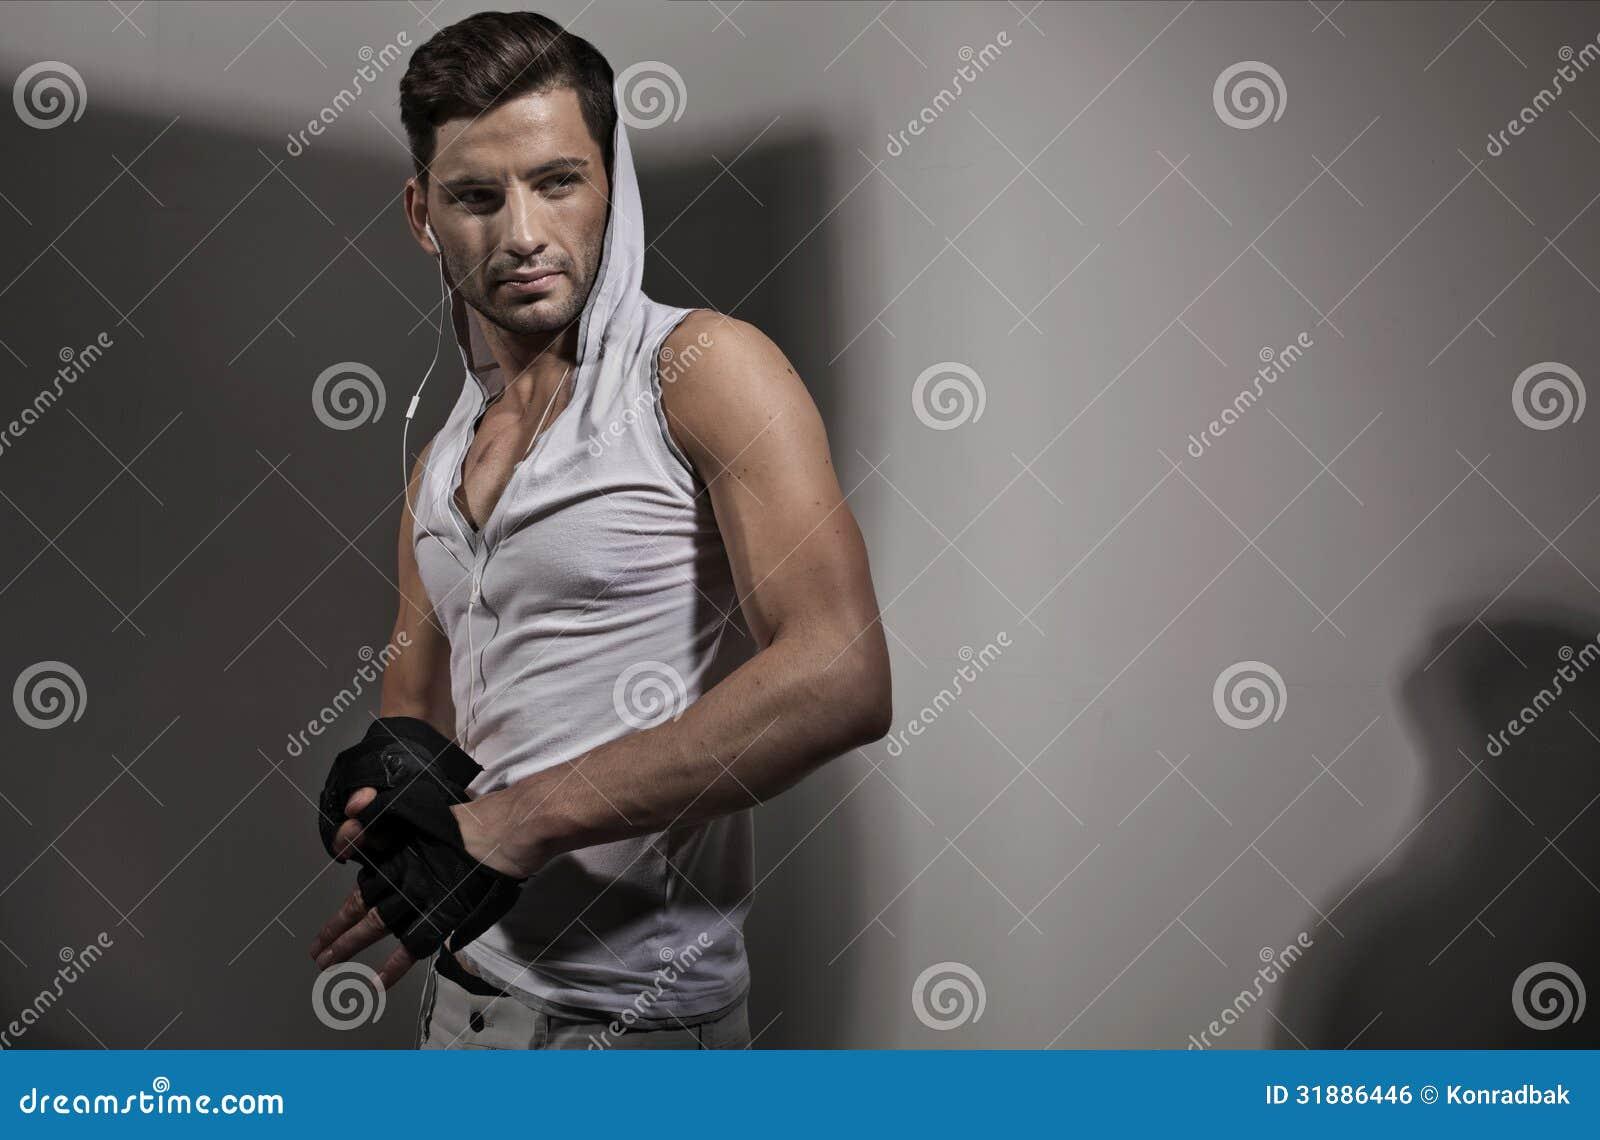 Indivíduo atlético considerável com olhar sério